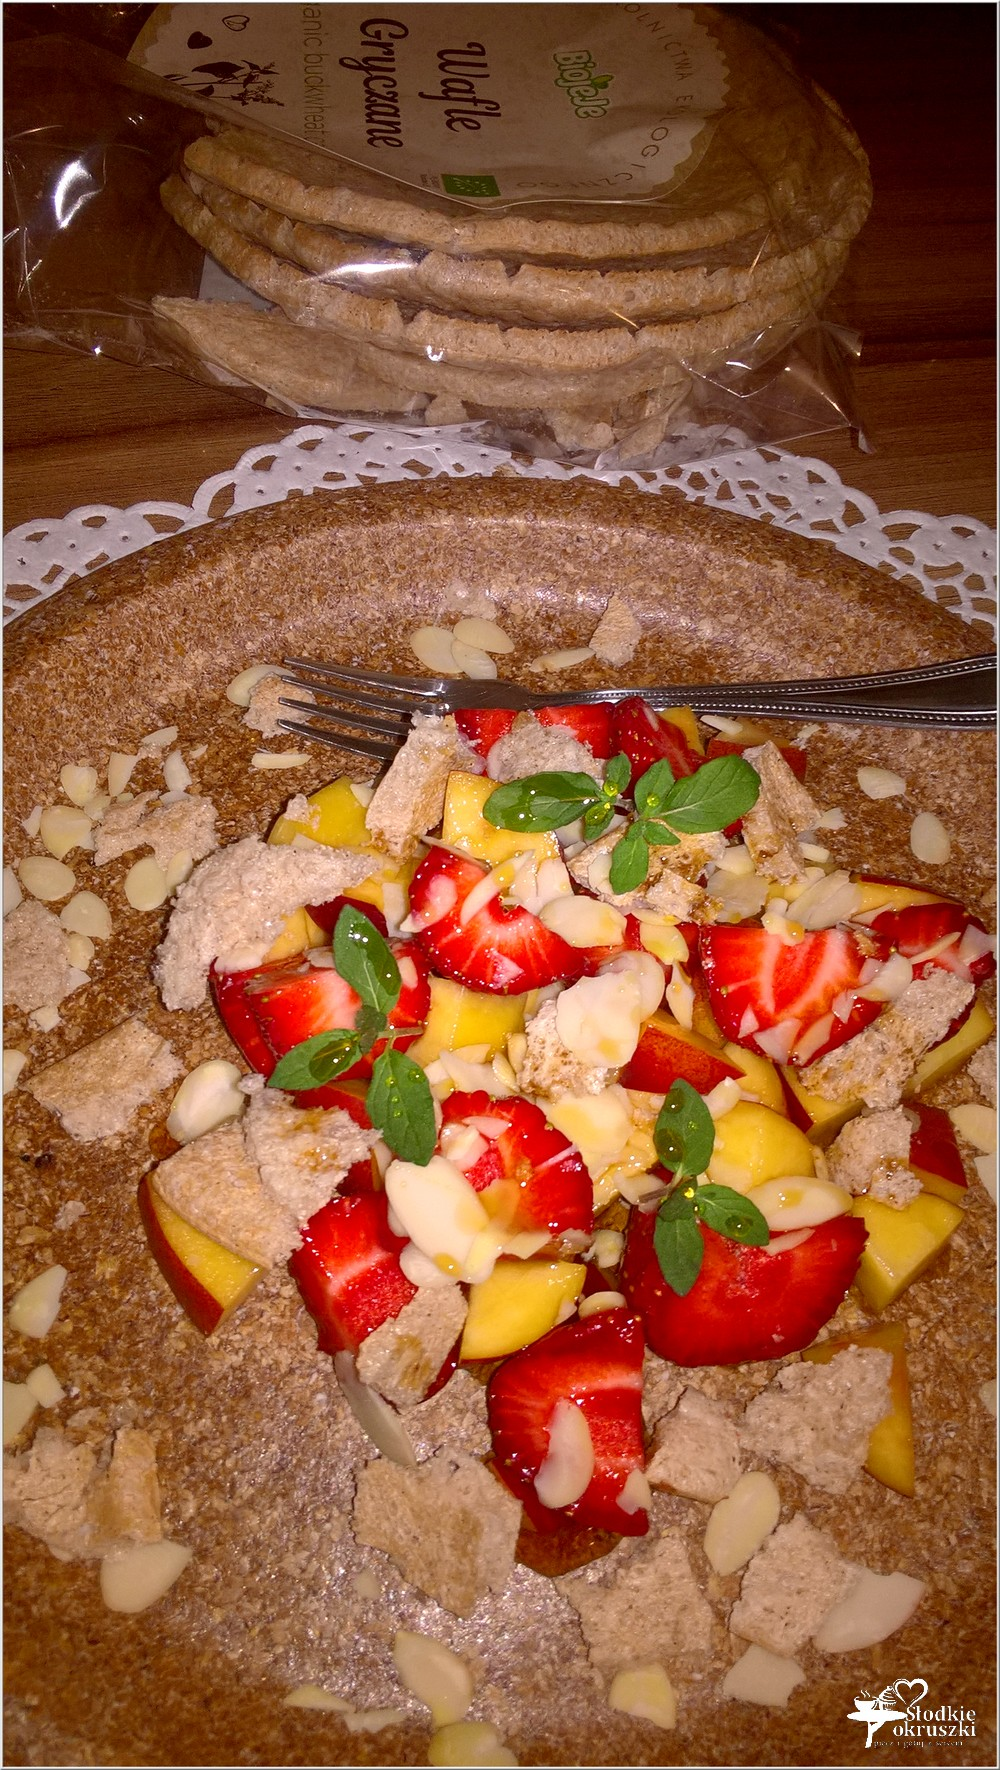 Letni deser owocowy z syropem klonowym (2)